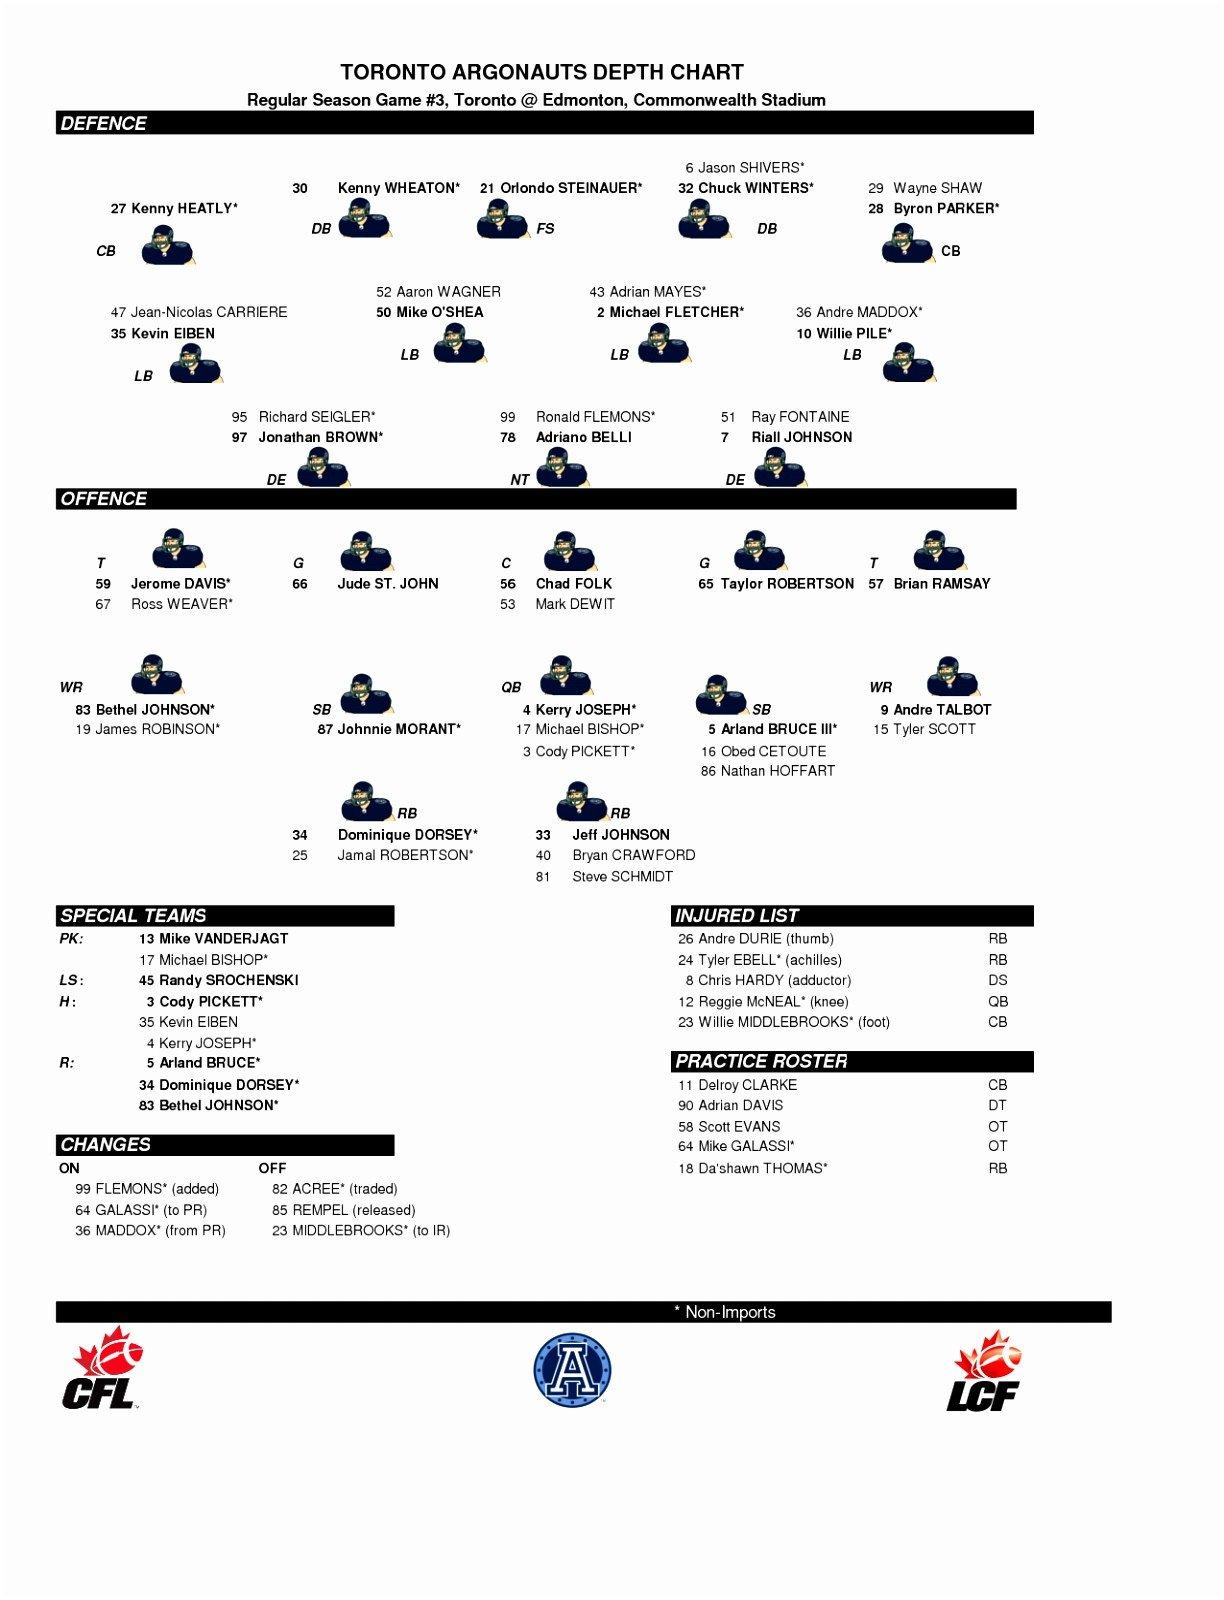 Football Depth Charts Templates 5 Printable Football Depth Chart Template Yaouu